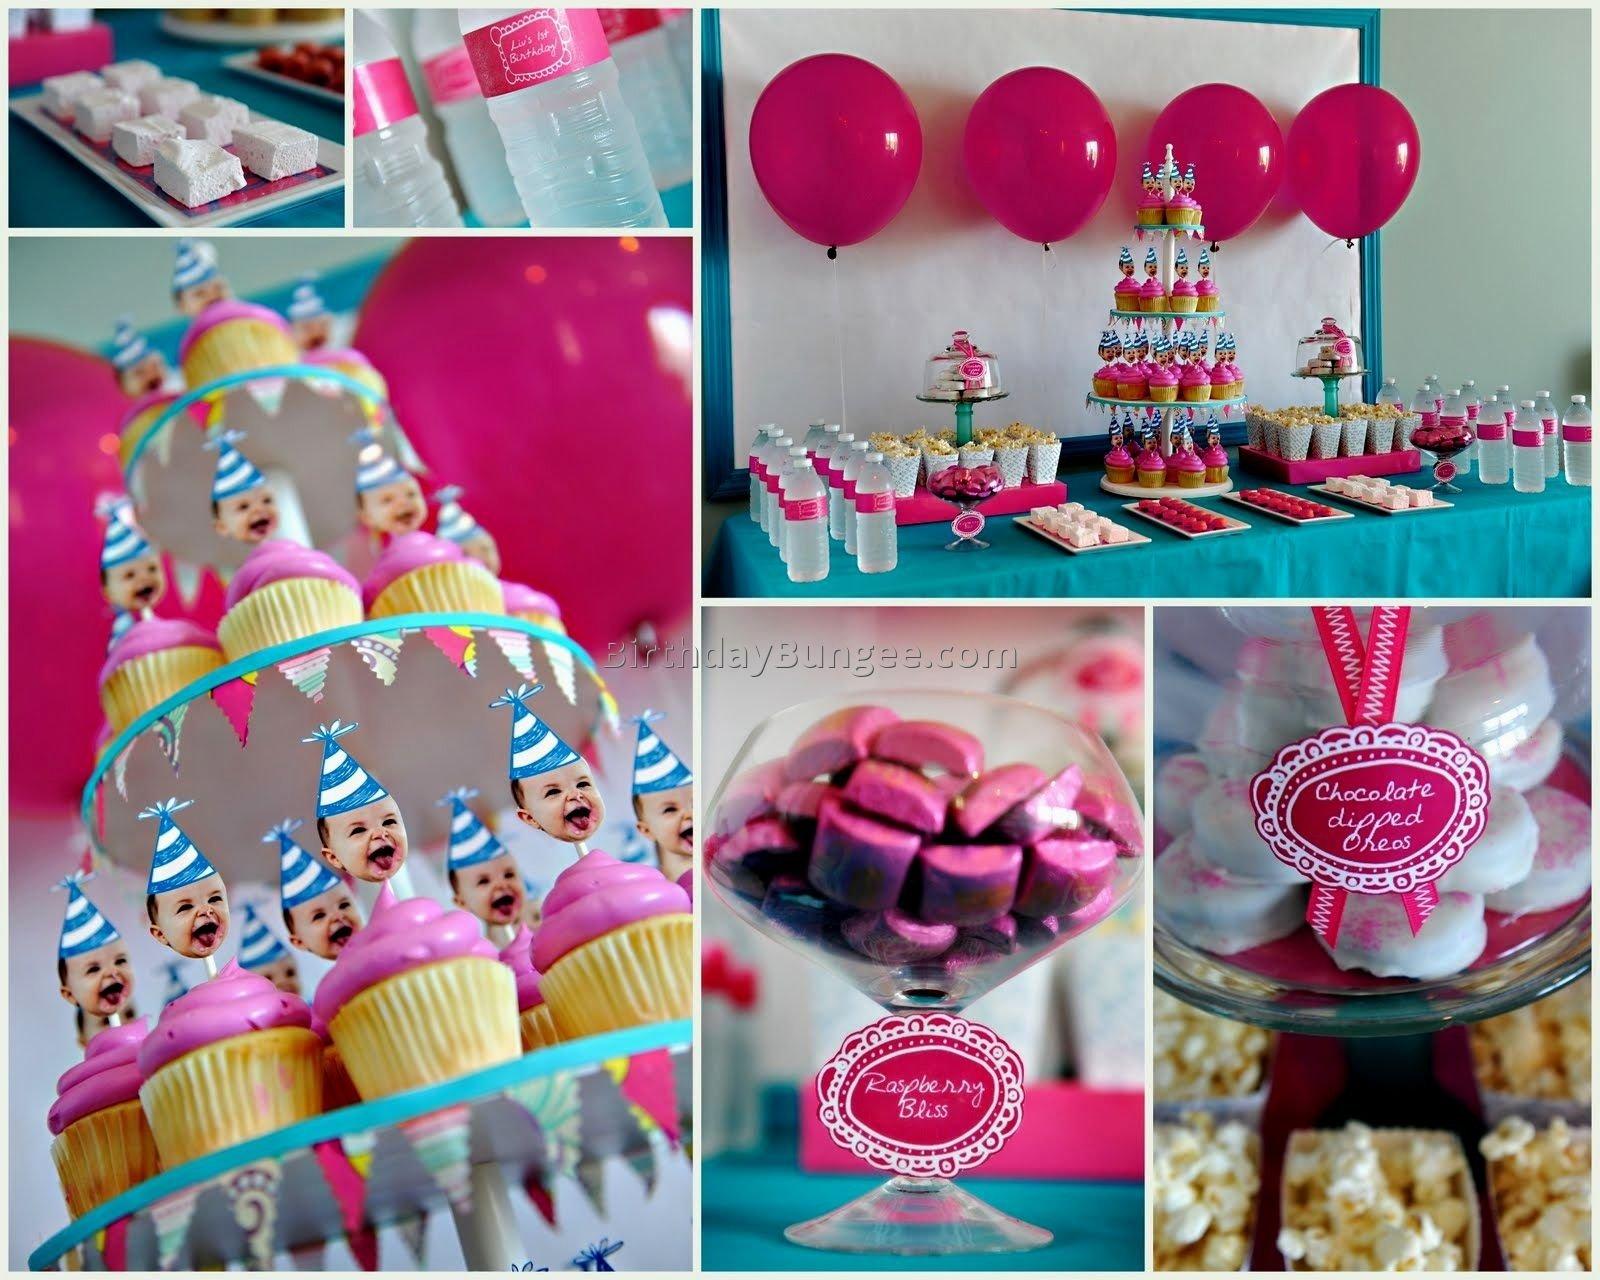 10 Wonderful Ideas For Year Old Birthday Themes 6 Boy Party